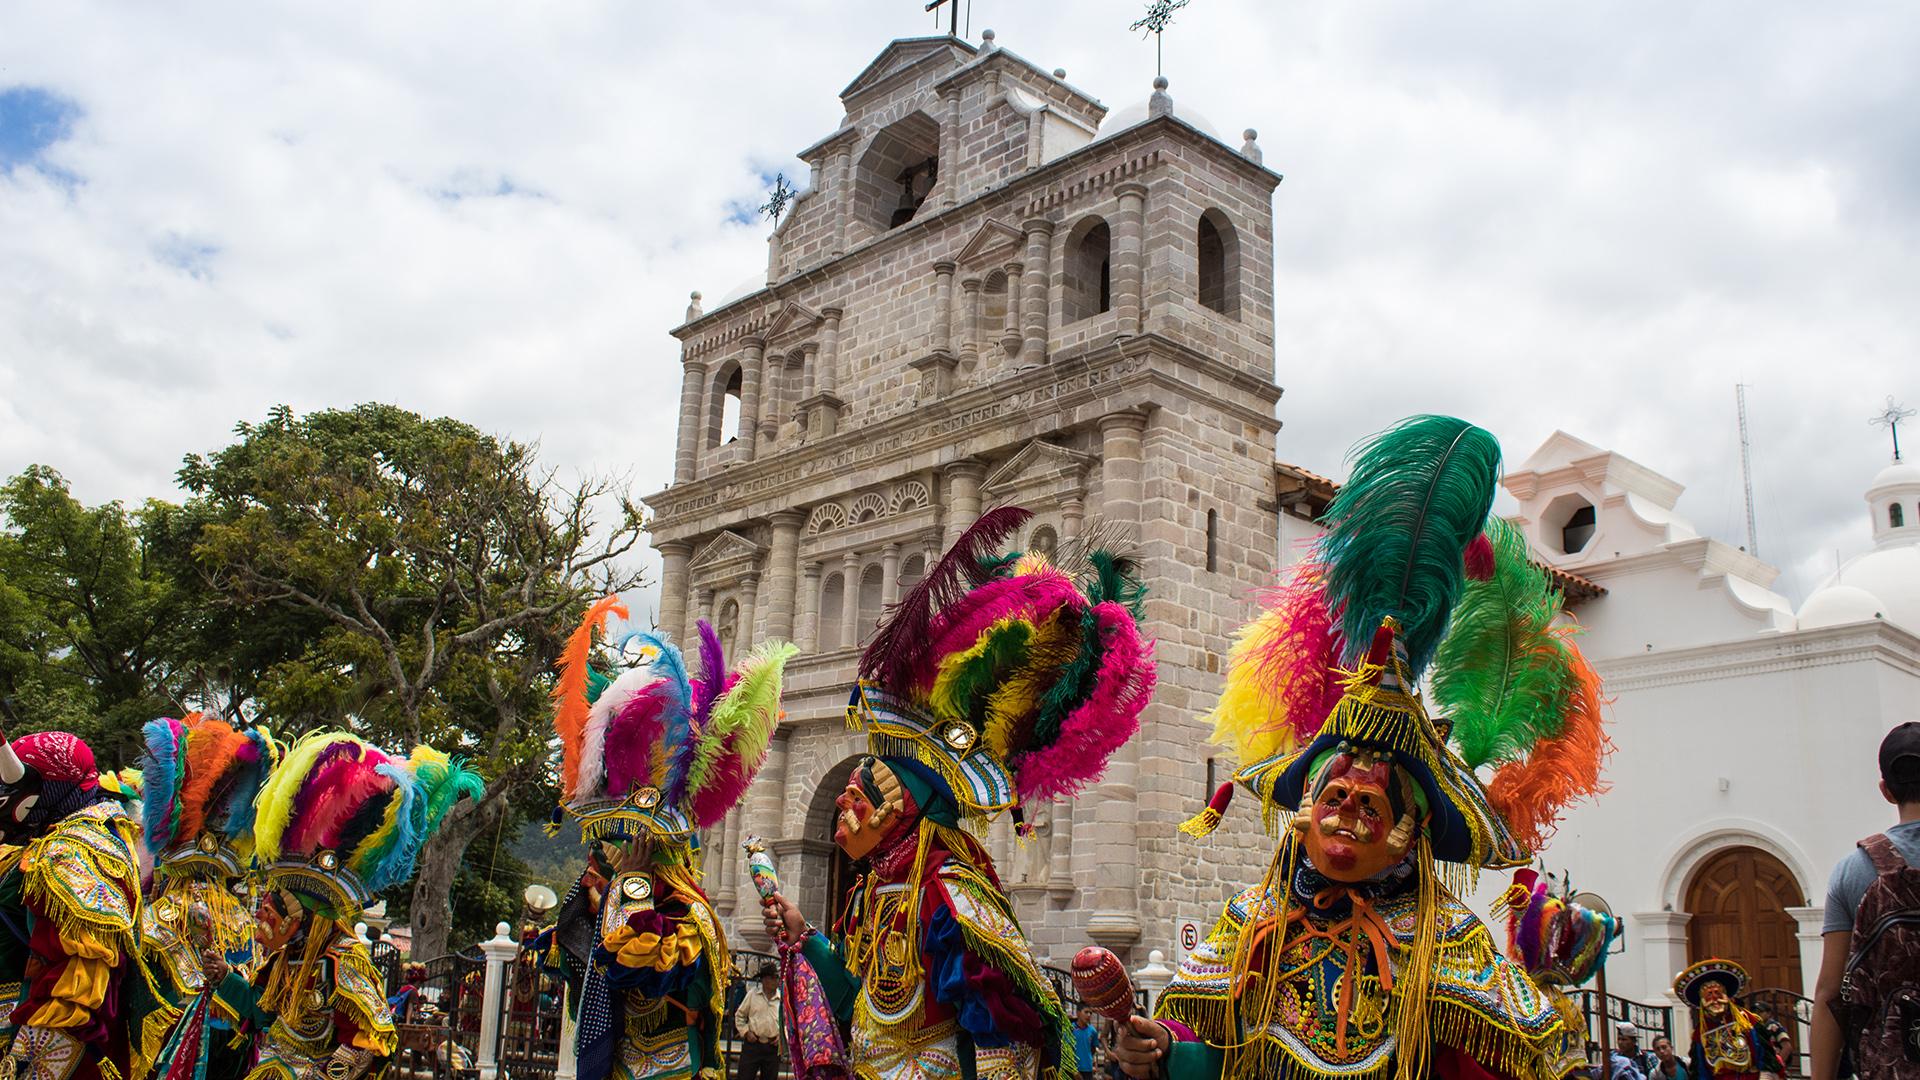 Cinco imprescindibles en un viaje a Guatemala